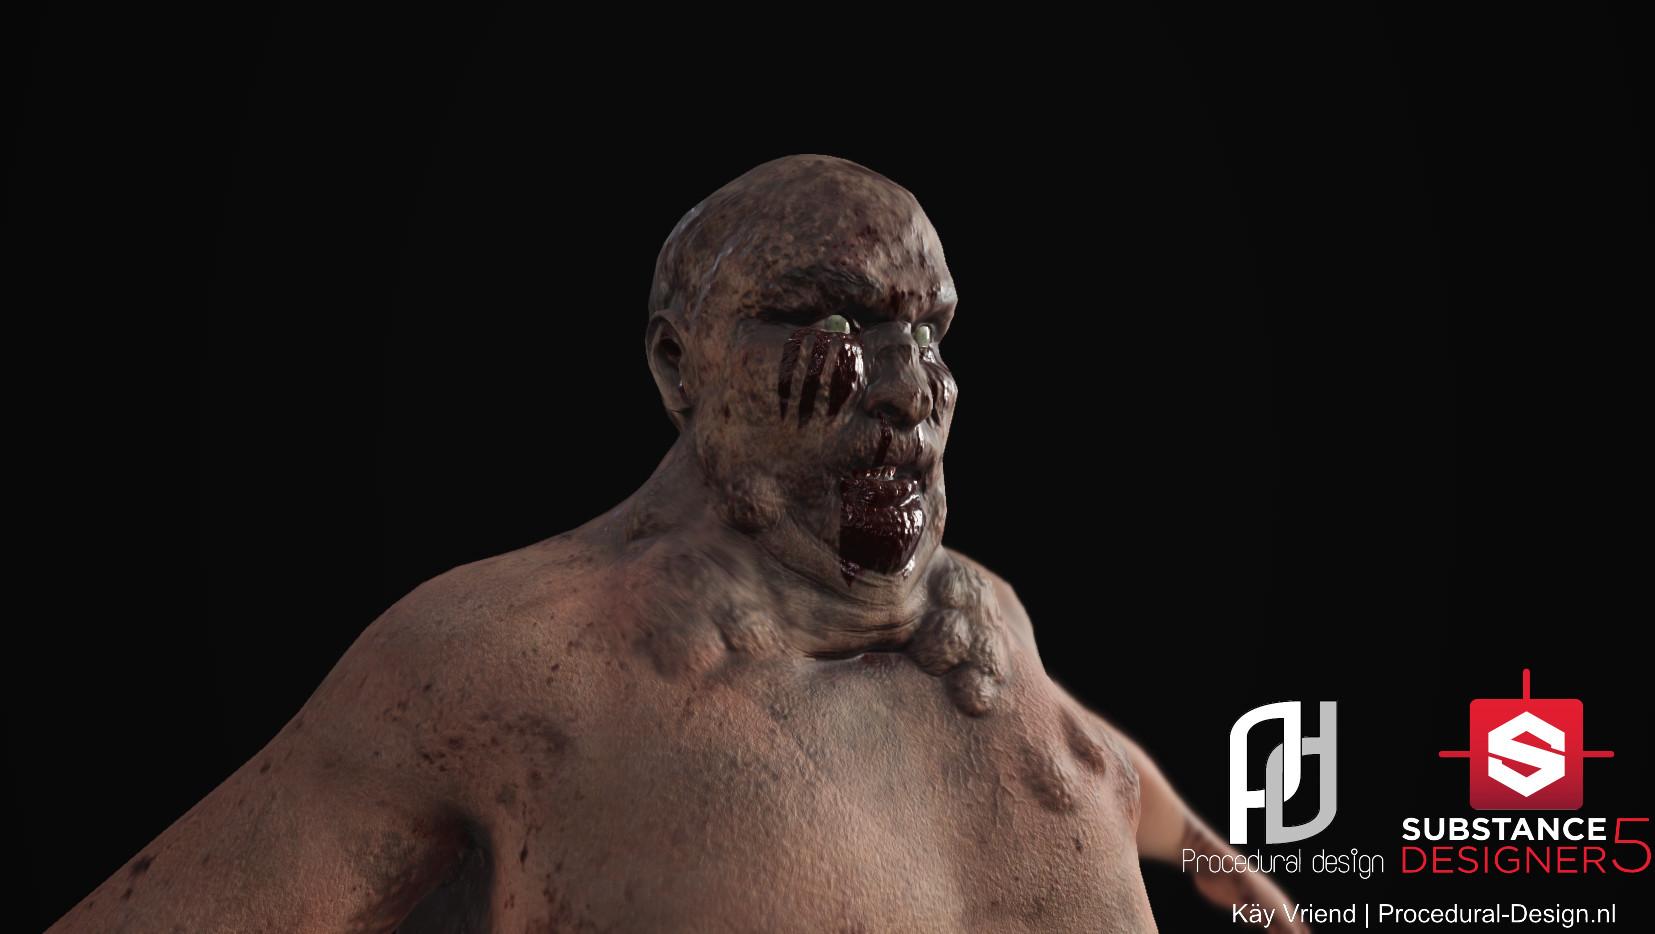 Kay vriend zombie 1